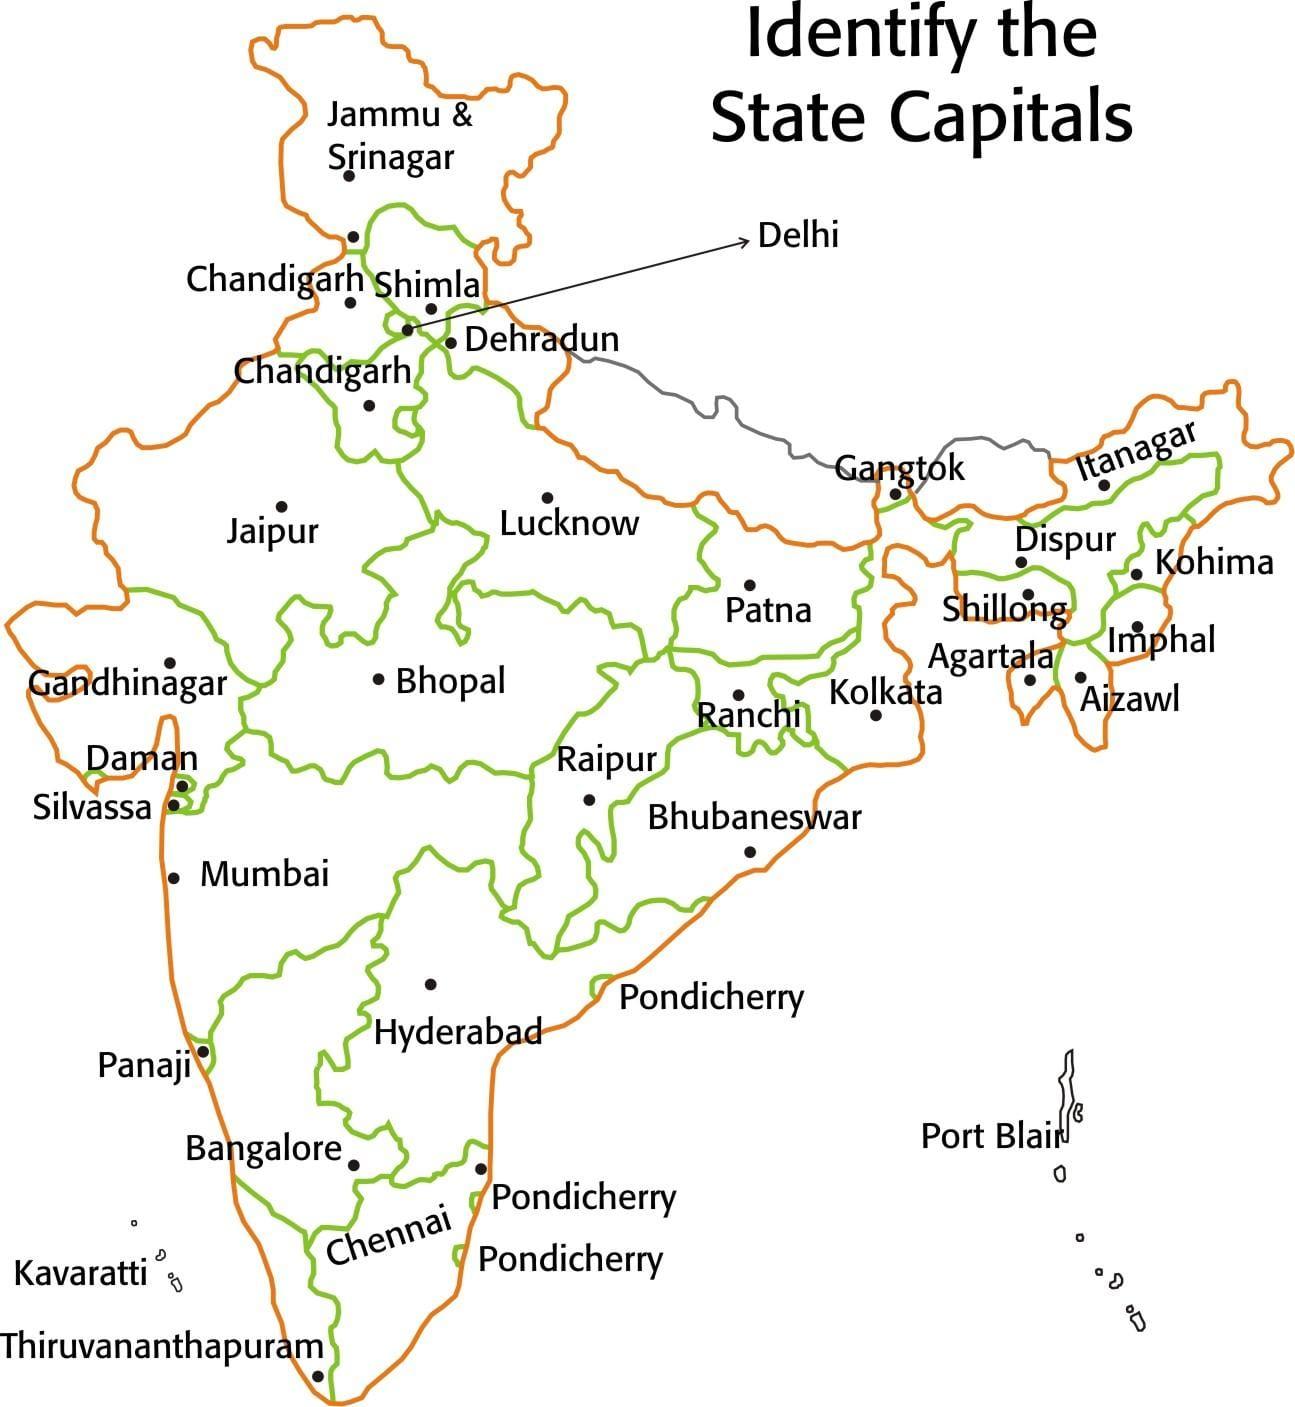 http://bharatmatamandir.in/wp-content/uploads/2010/03/State_Capitals1-1-279x300.jpg